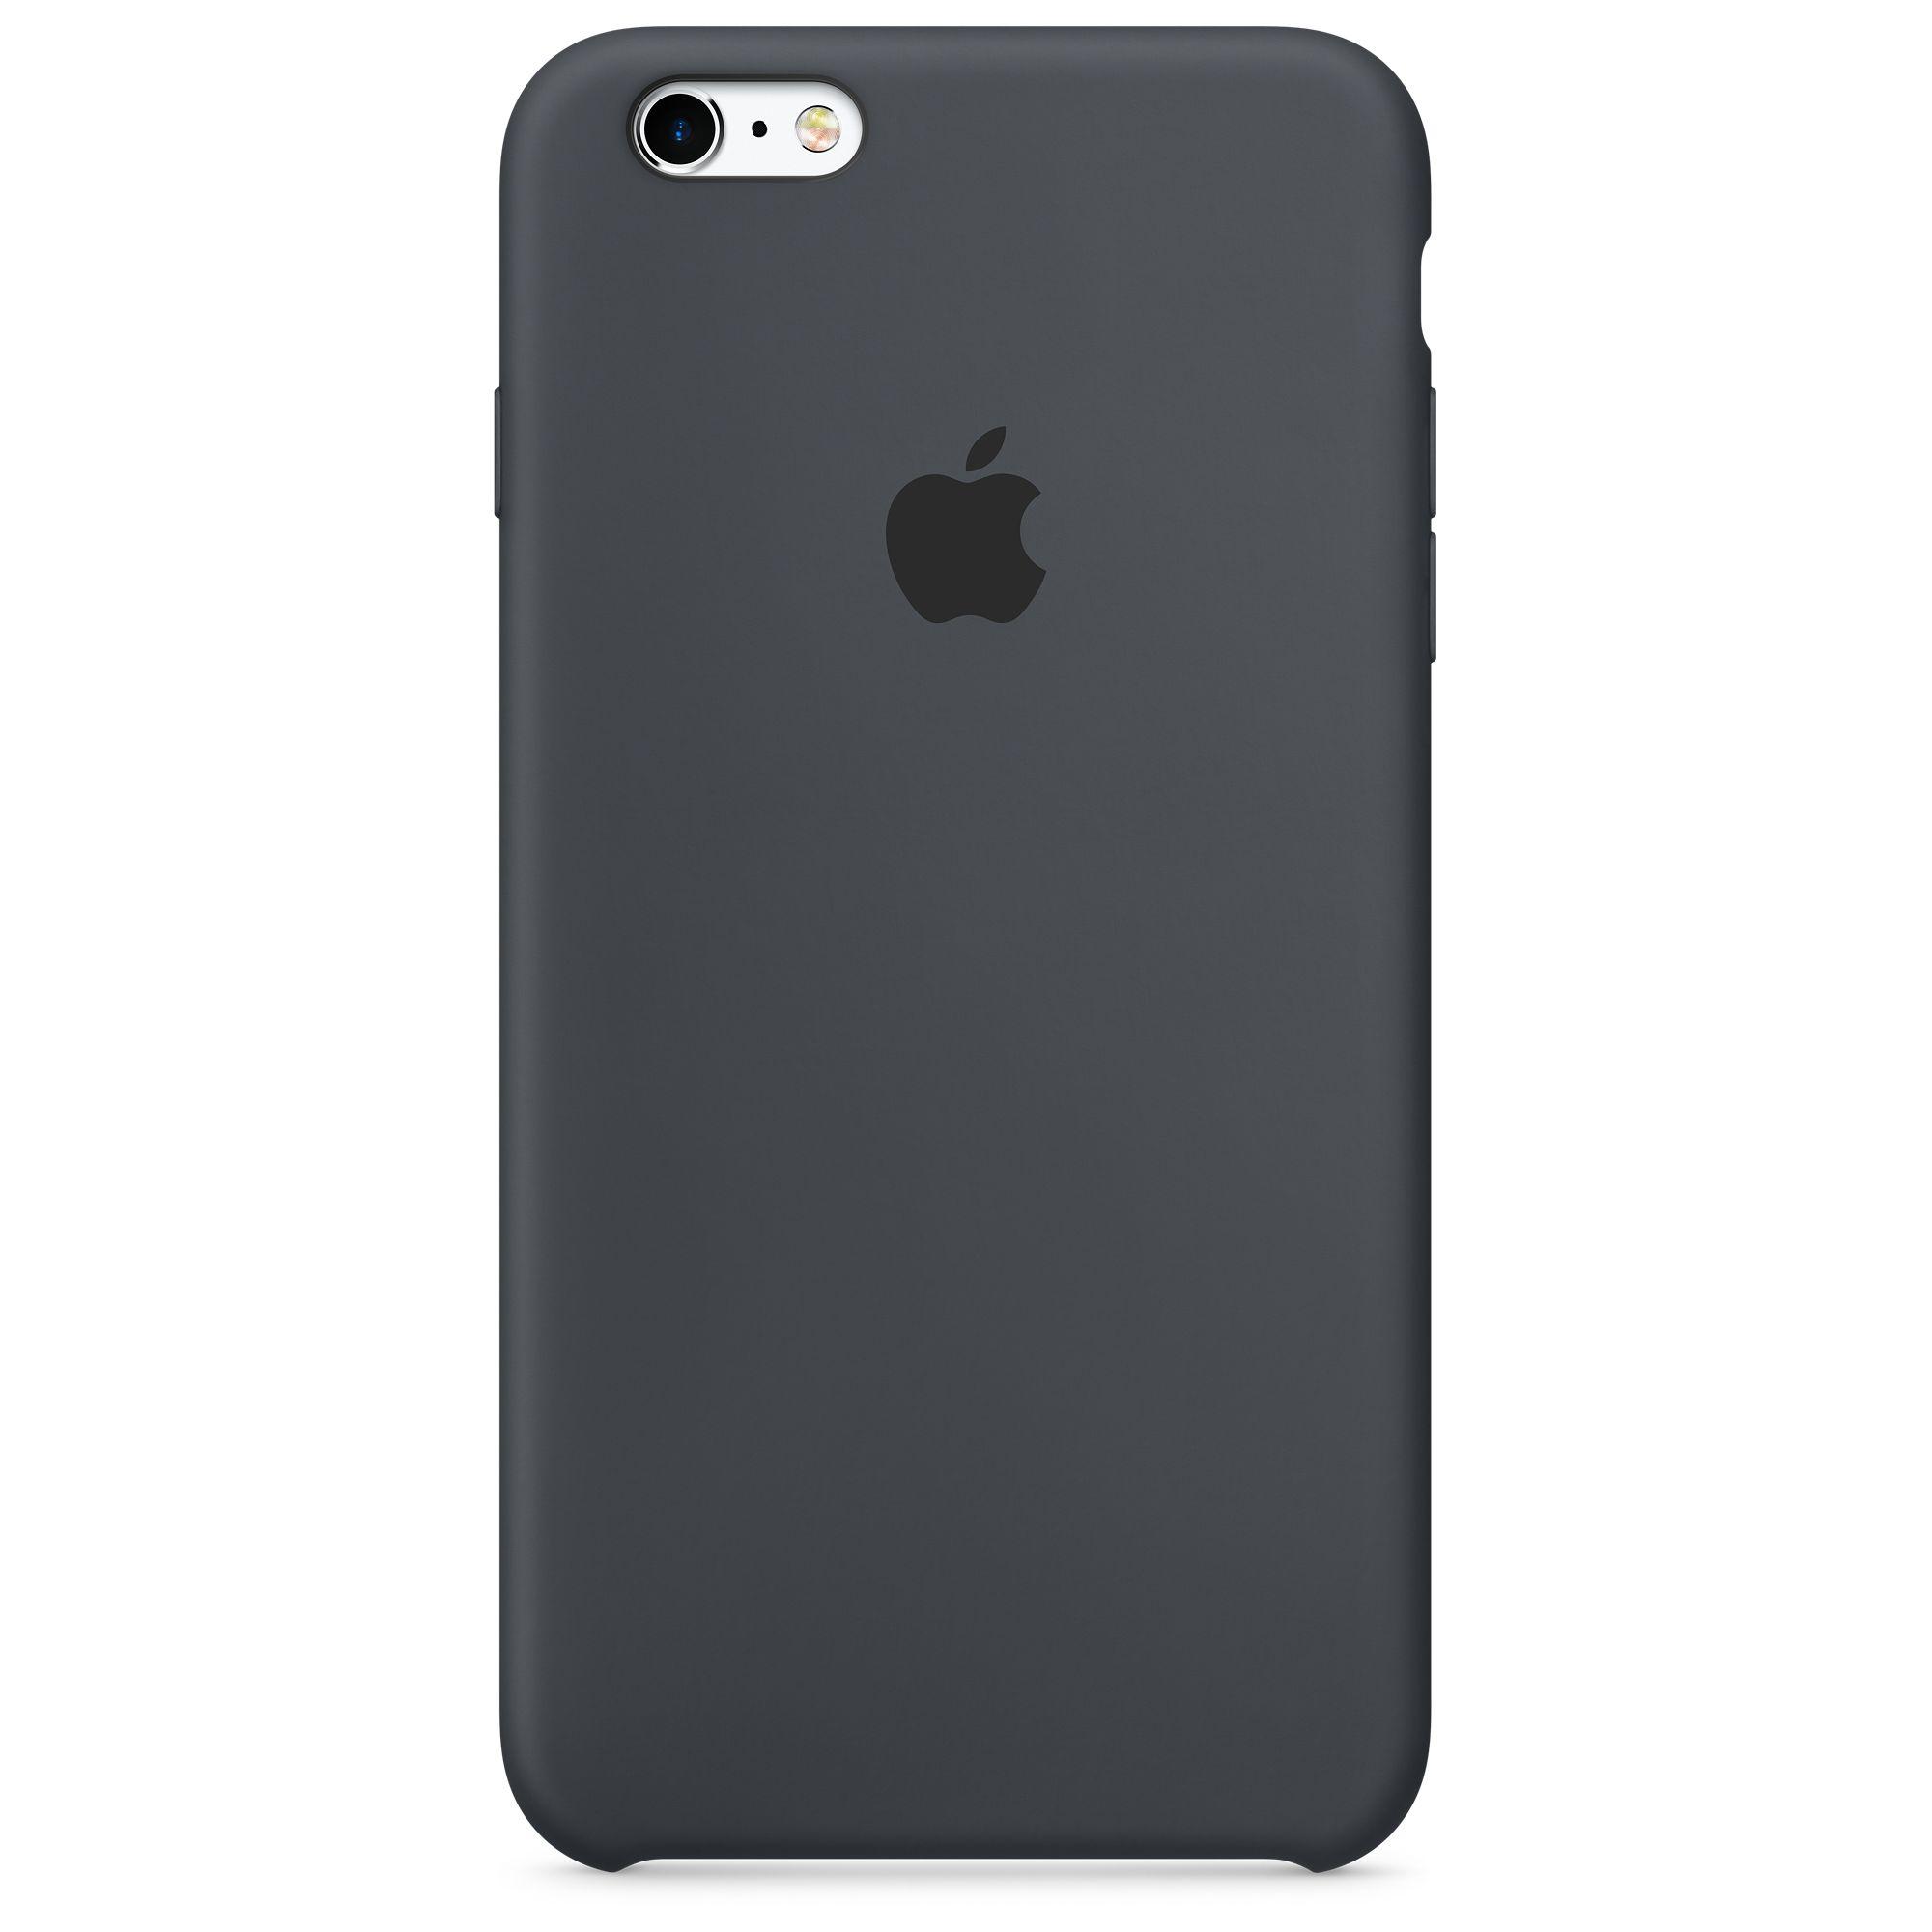 Pouzdro / kryt pro Apple iPhone 6 Plus / 6S Plus - Apple, Silicone Case Charcoal Gray